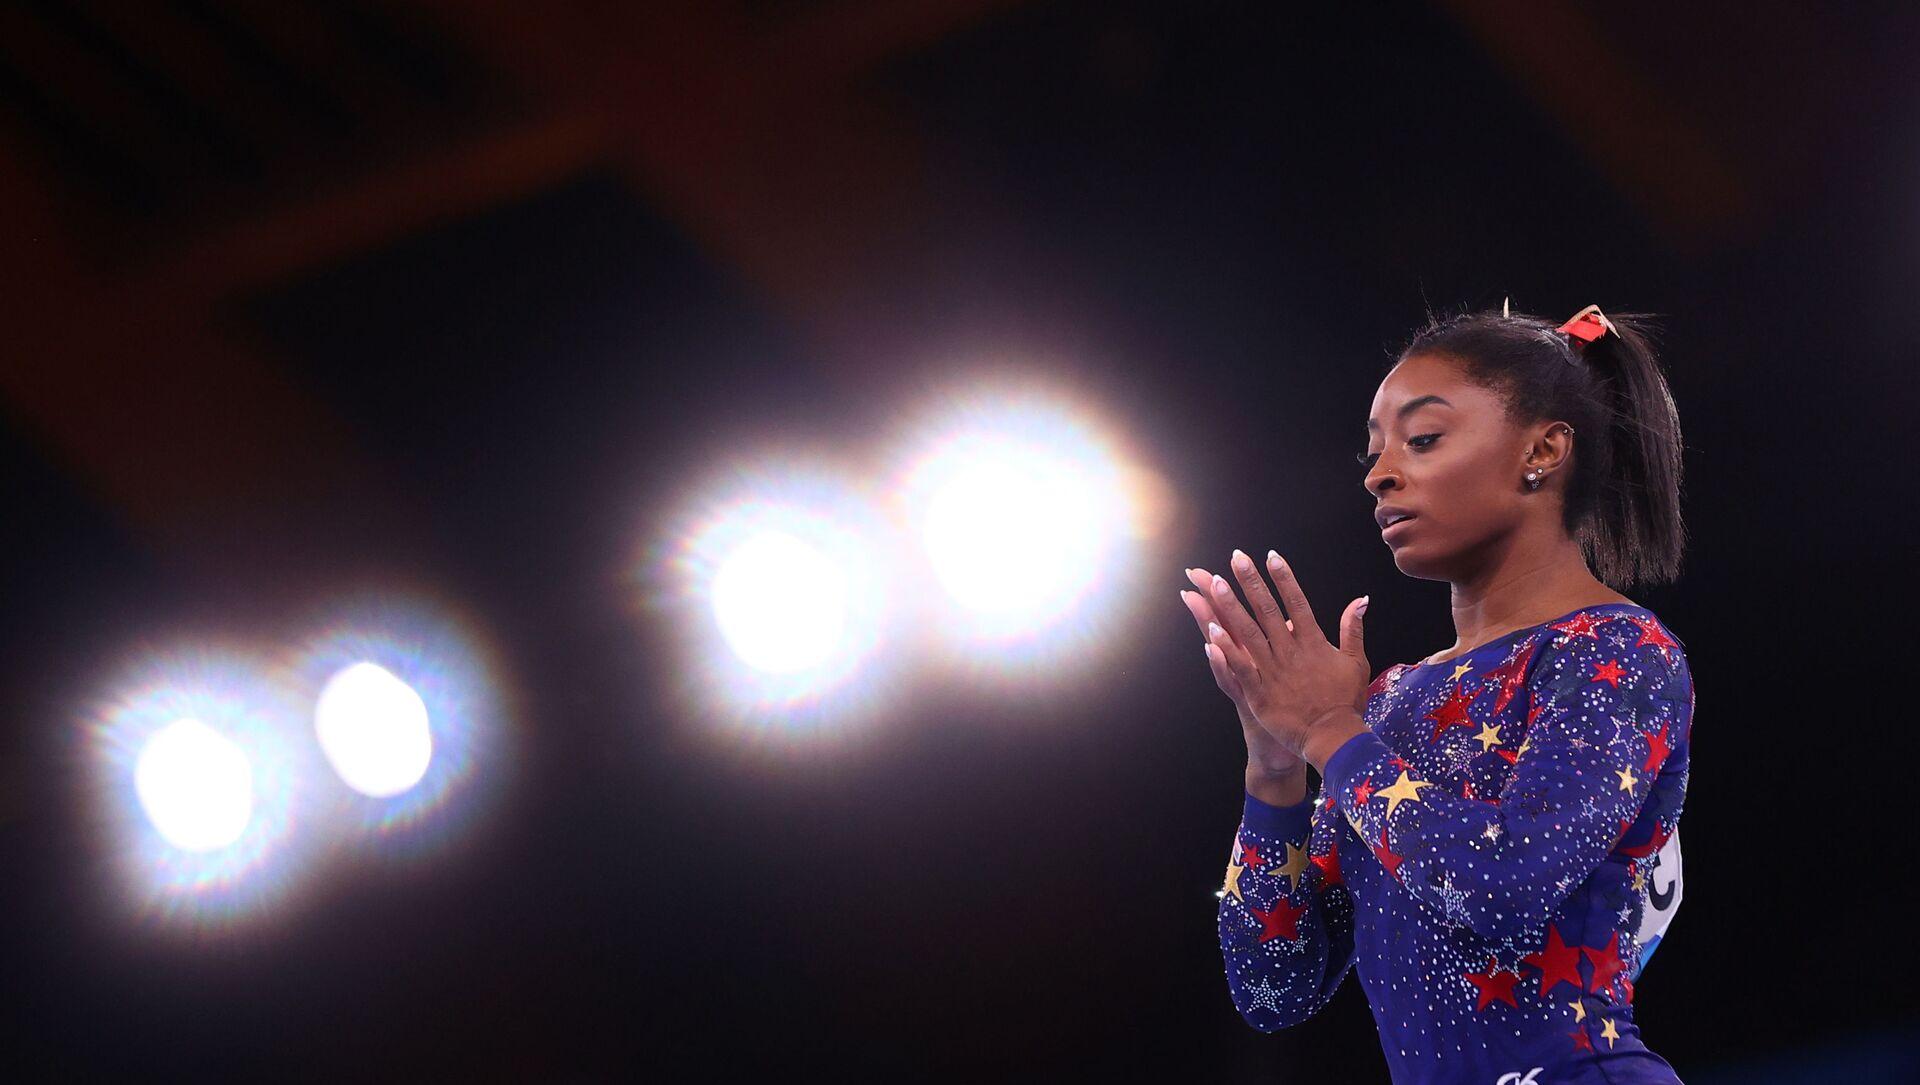 Tokyo 2020 Olympics - Gymnastics - Artistic - Women's Beam - Qualification - Ariake Gymnastics Centre, Tokyo, Japan - July 25, 2021. Simone Biles of the United States in action on the beam. - Sputnik International, 1920, 29.07.2021